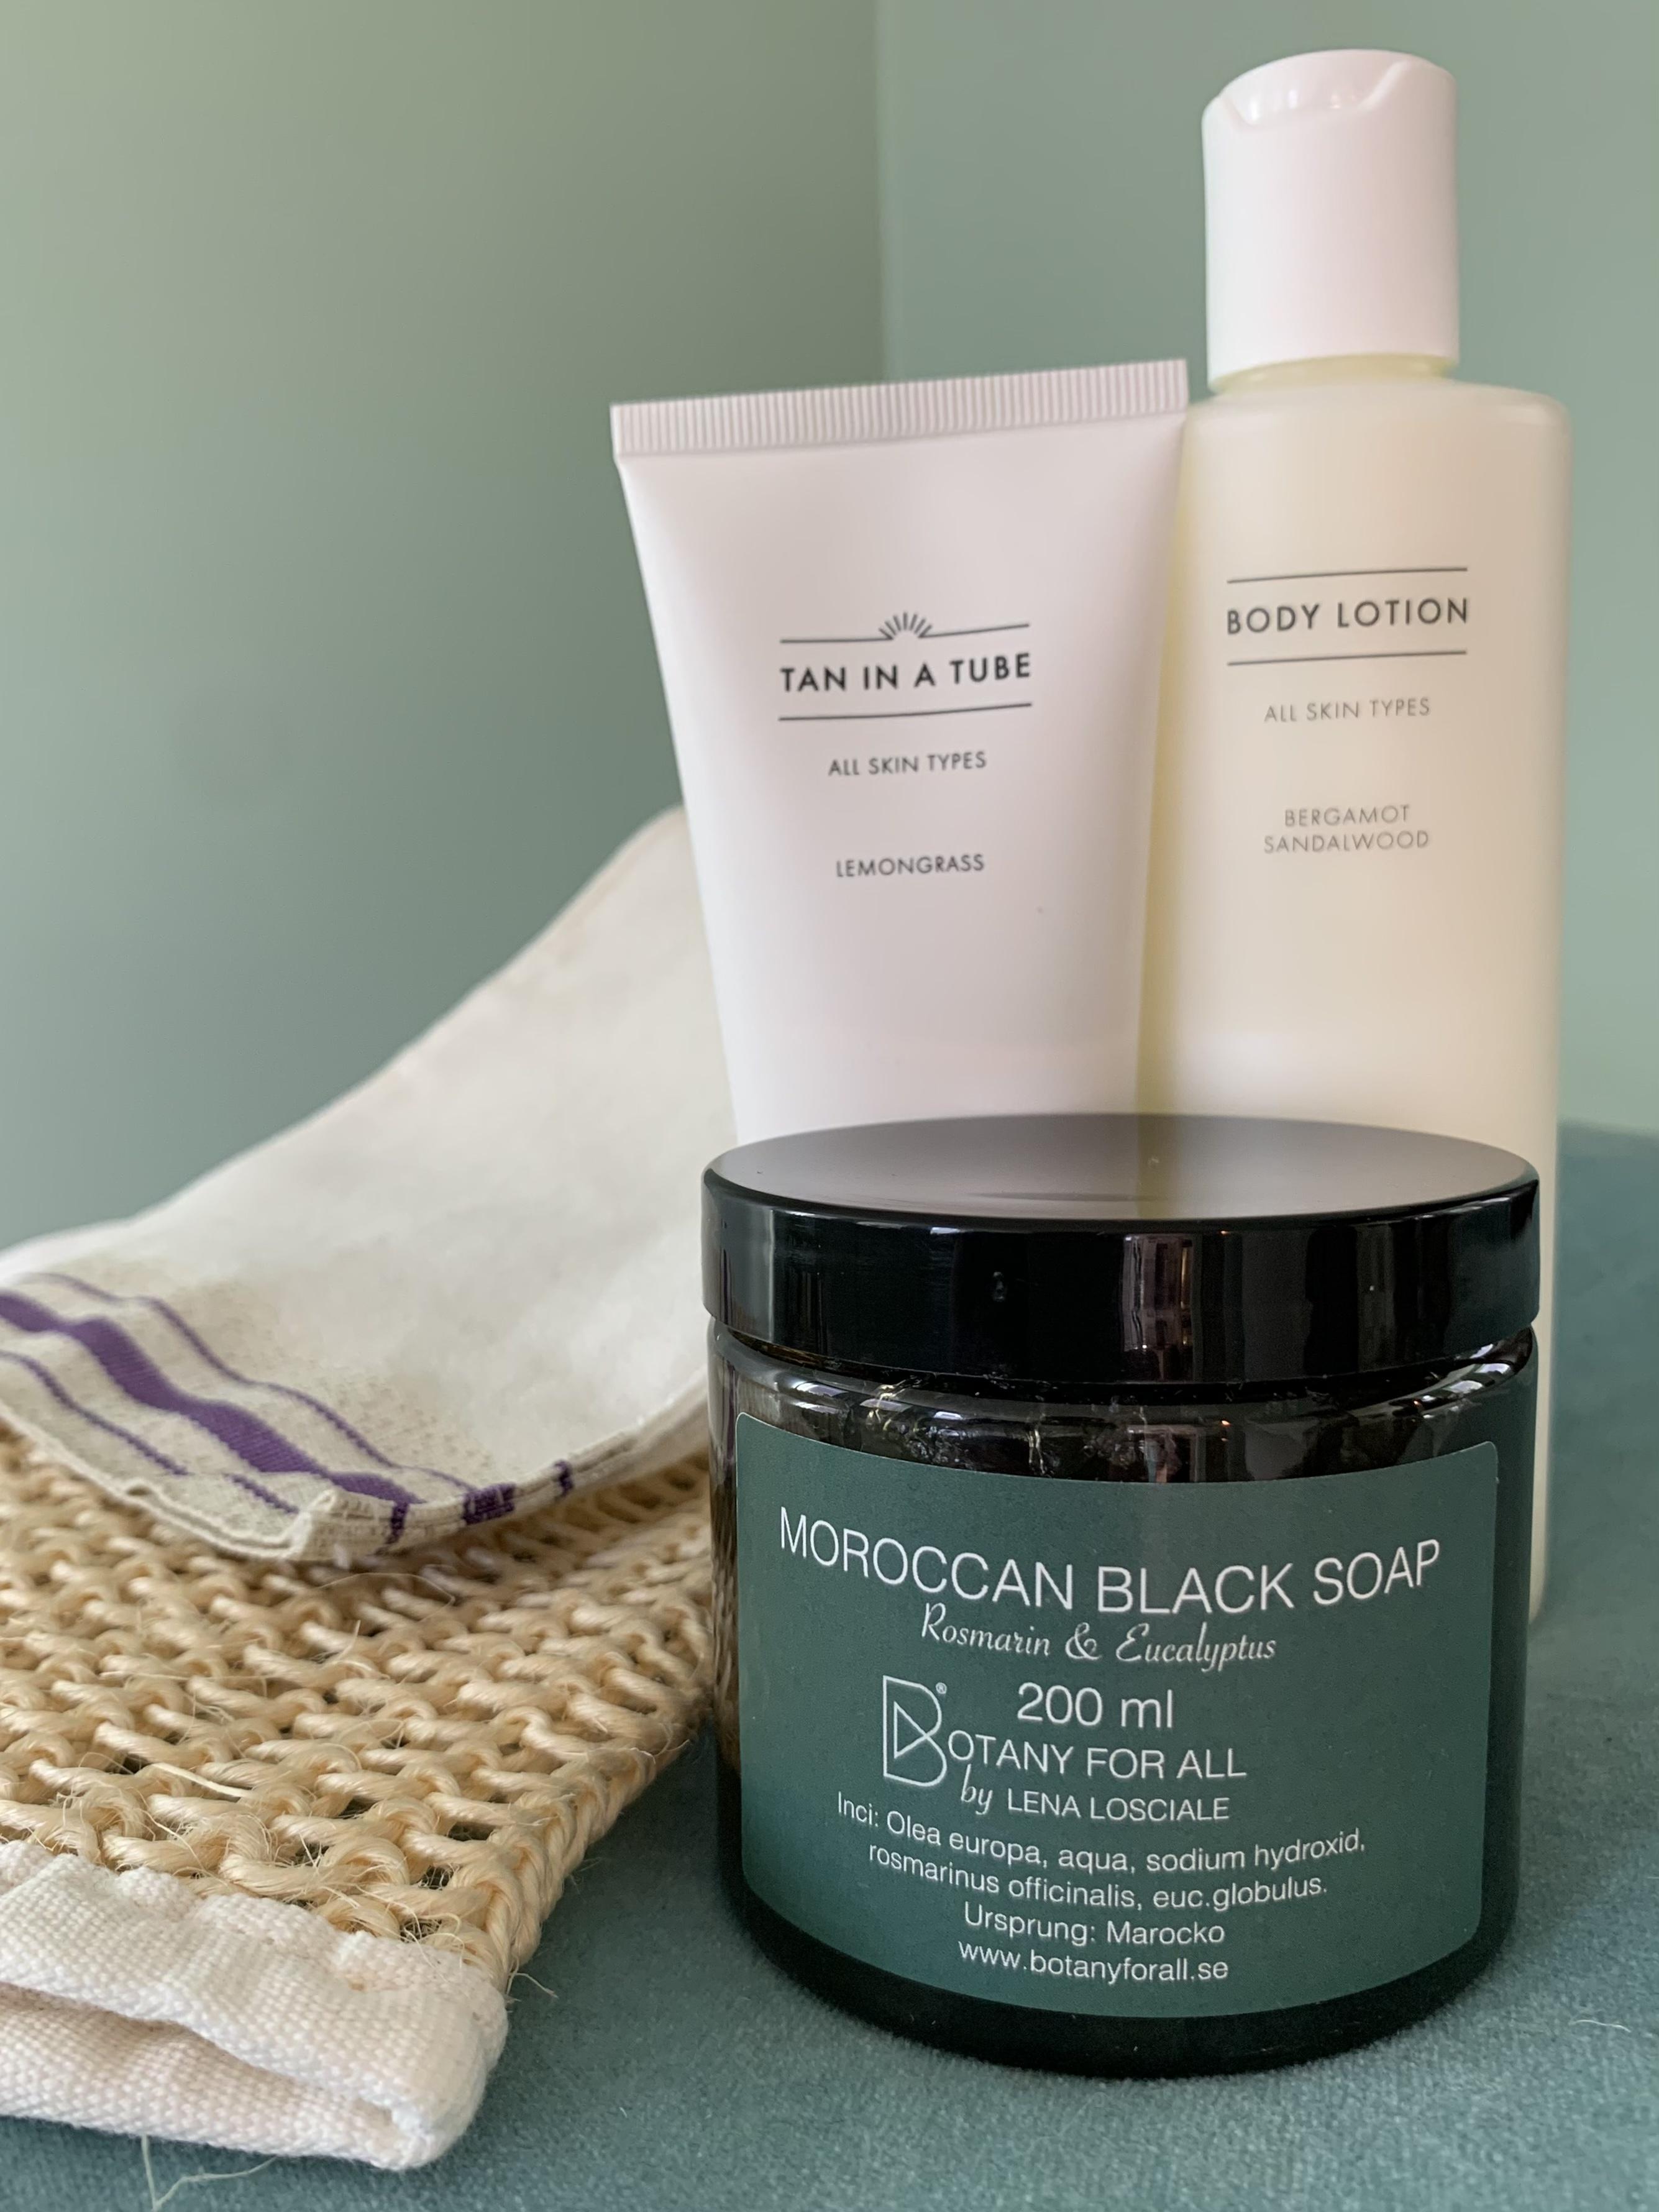 Moroccan Black Soap